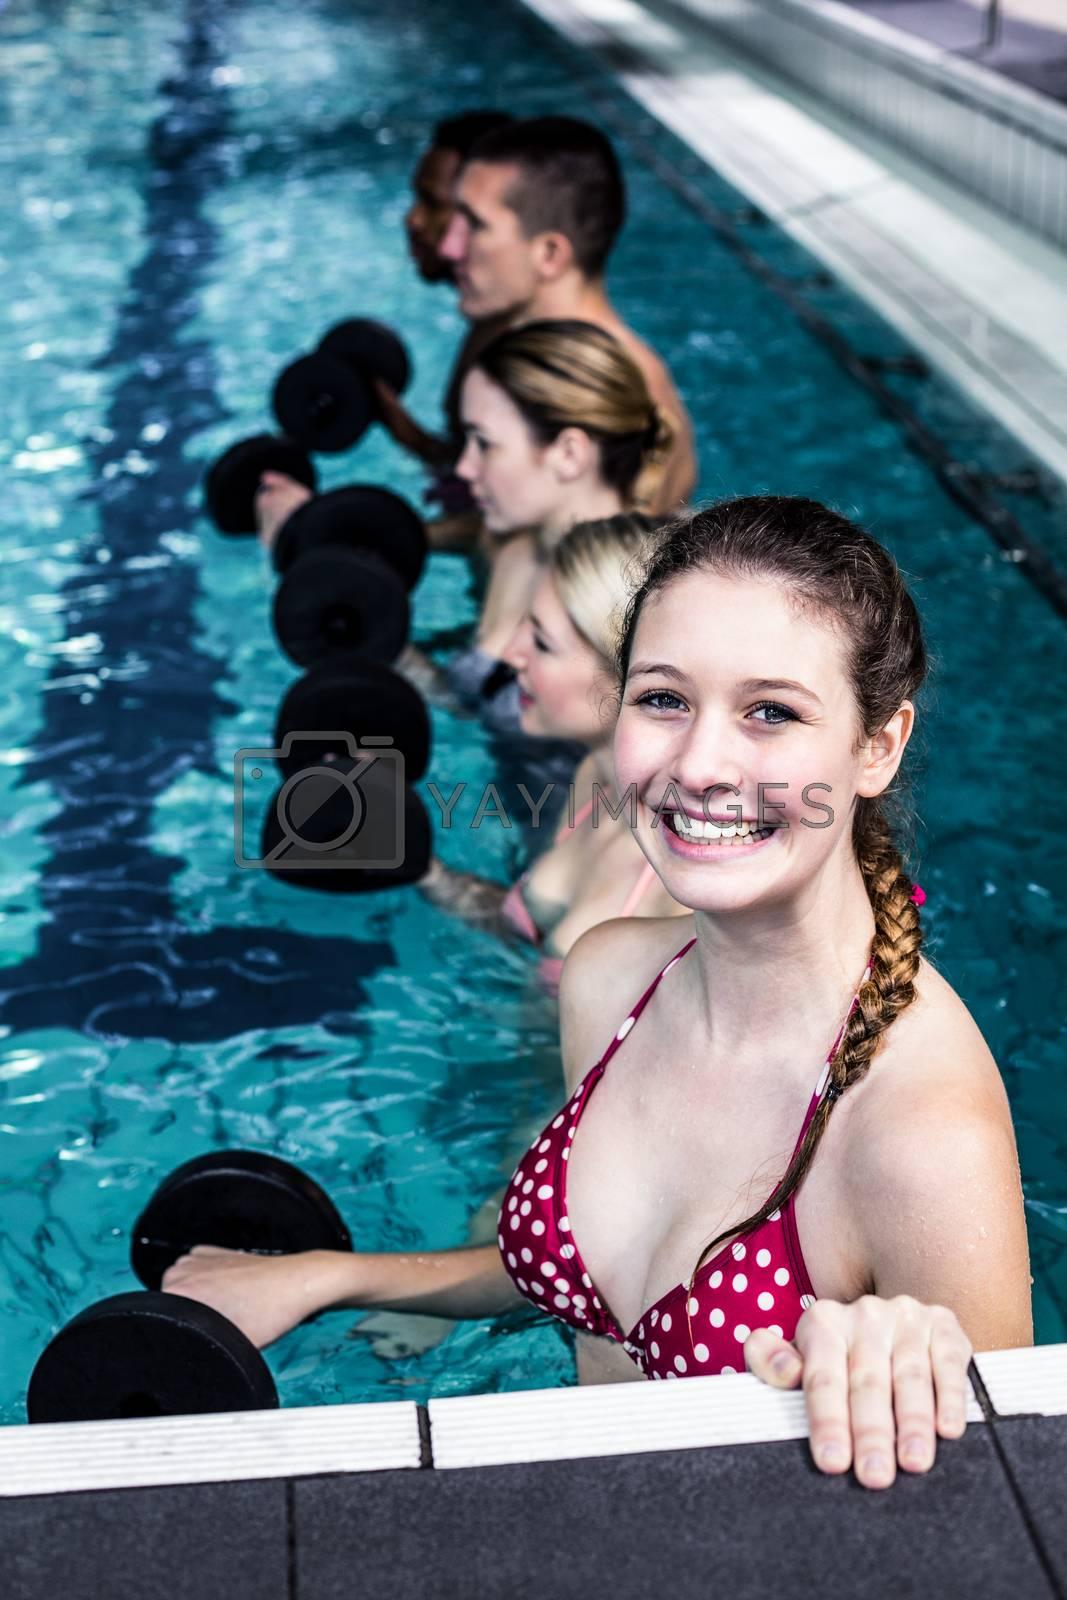 Fit people doing an aqua aerobics class in swimming pool